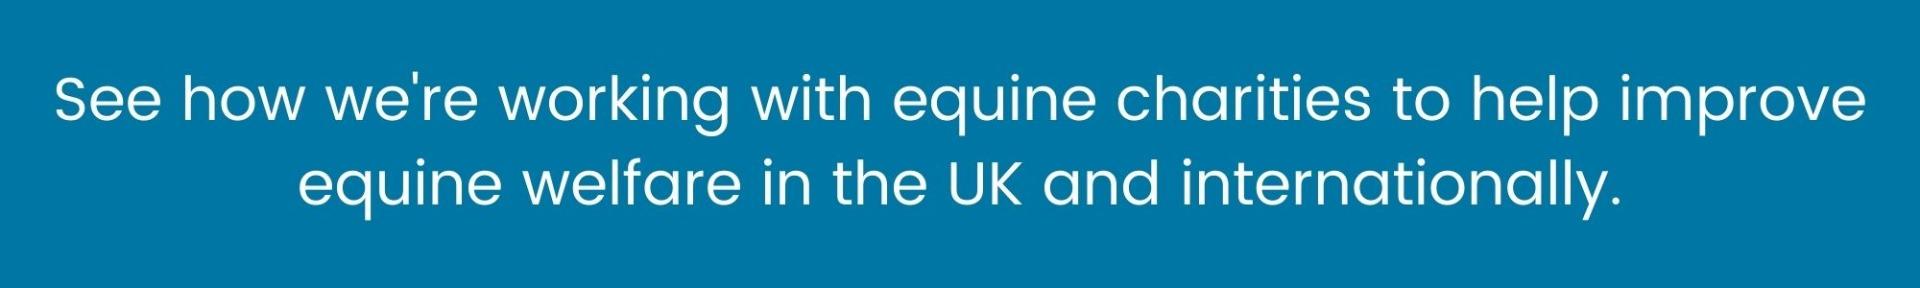 Equine charities and harry hall